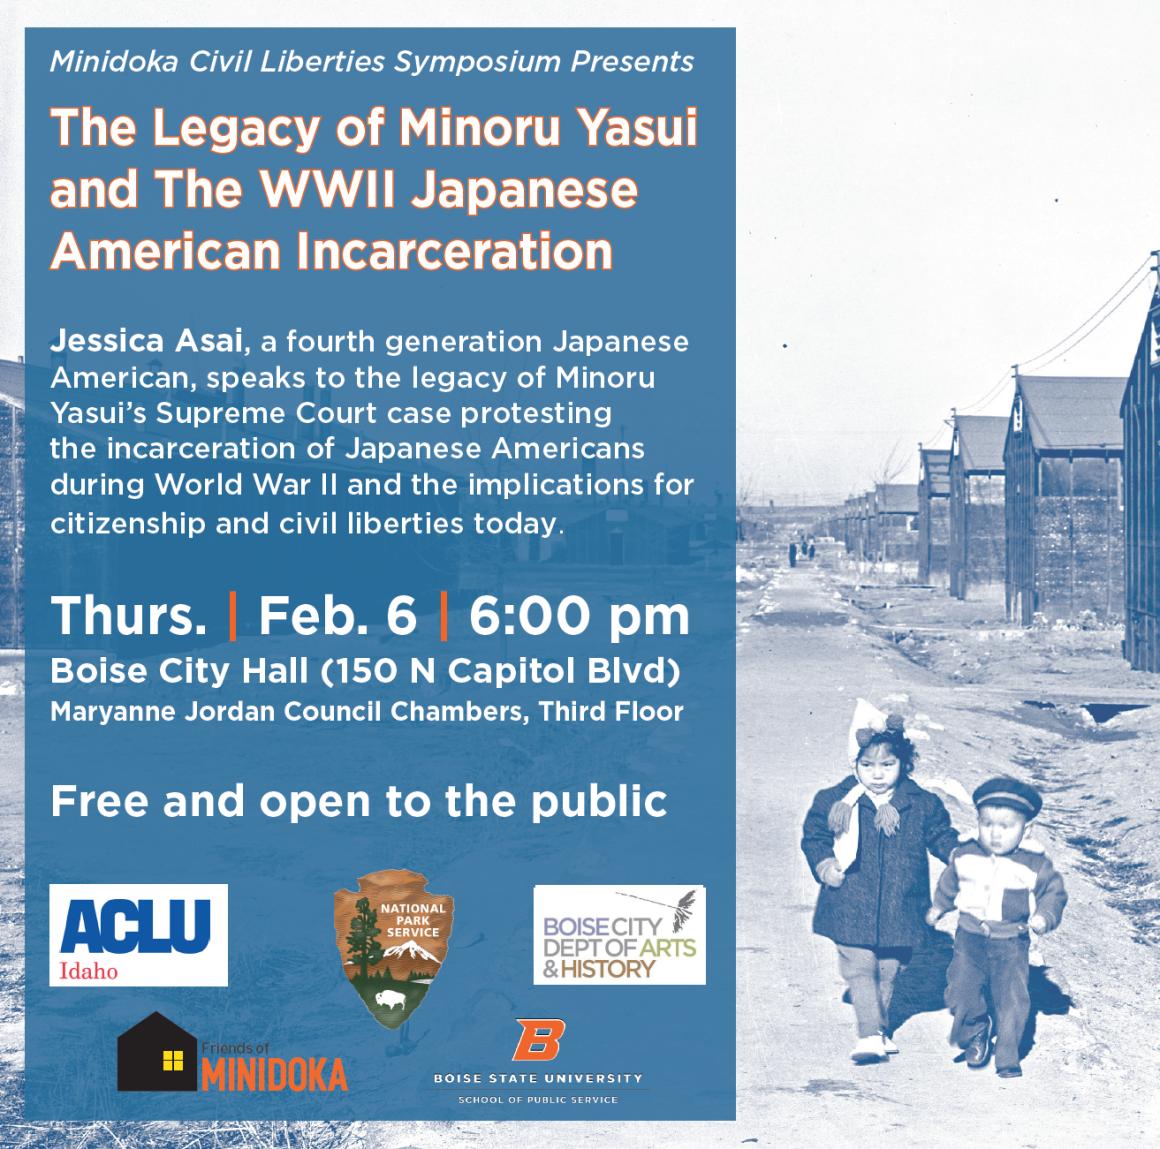 Minidoka civil liberties symposium poster